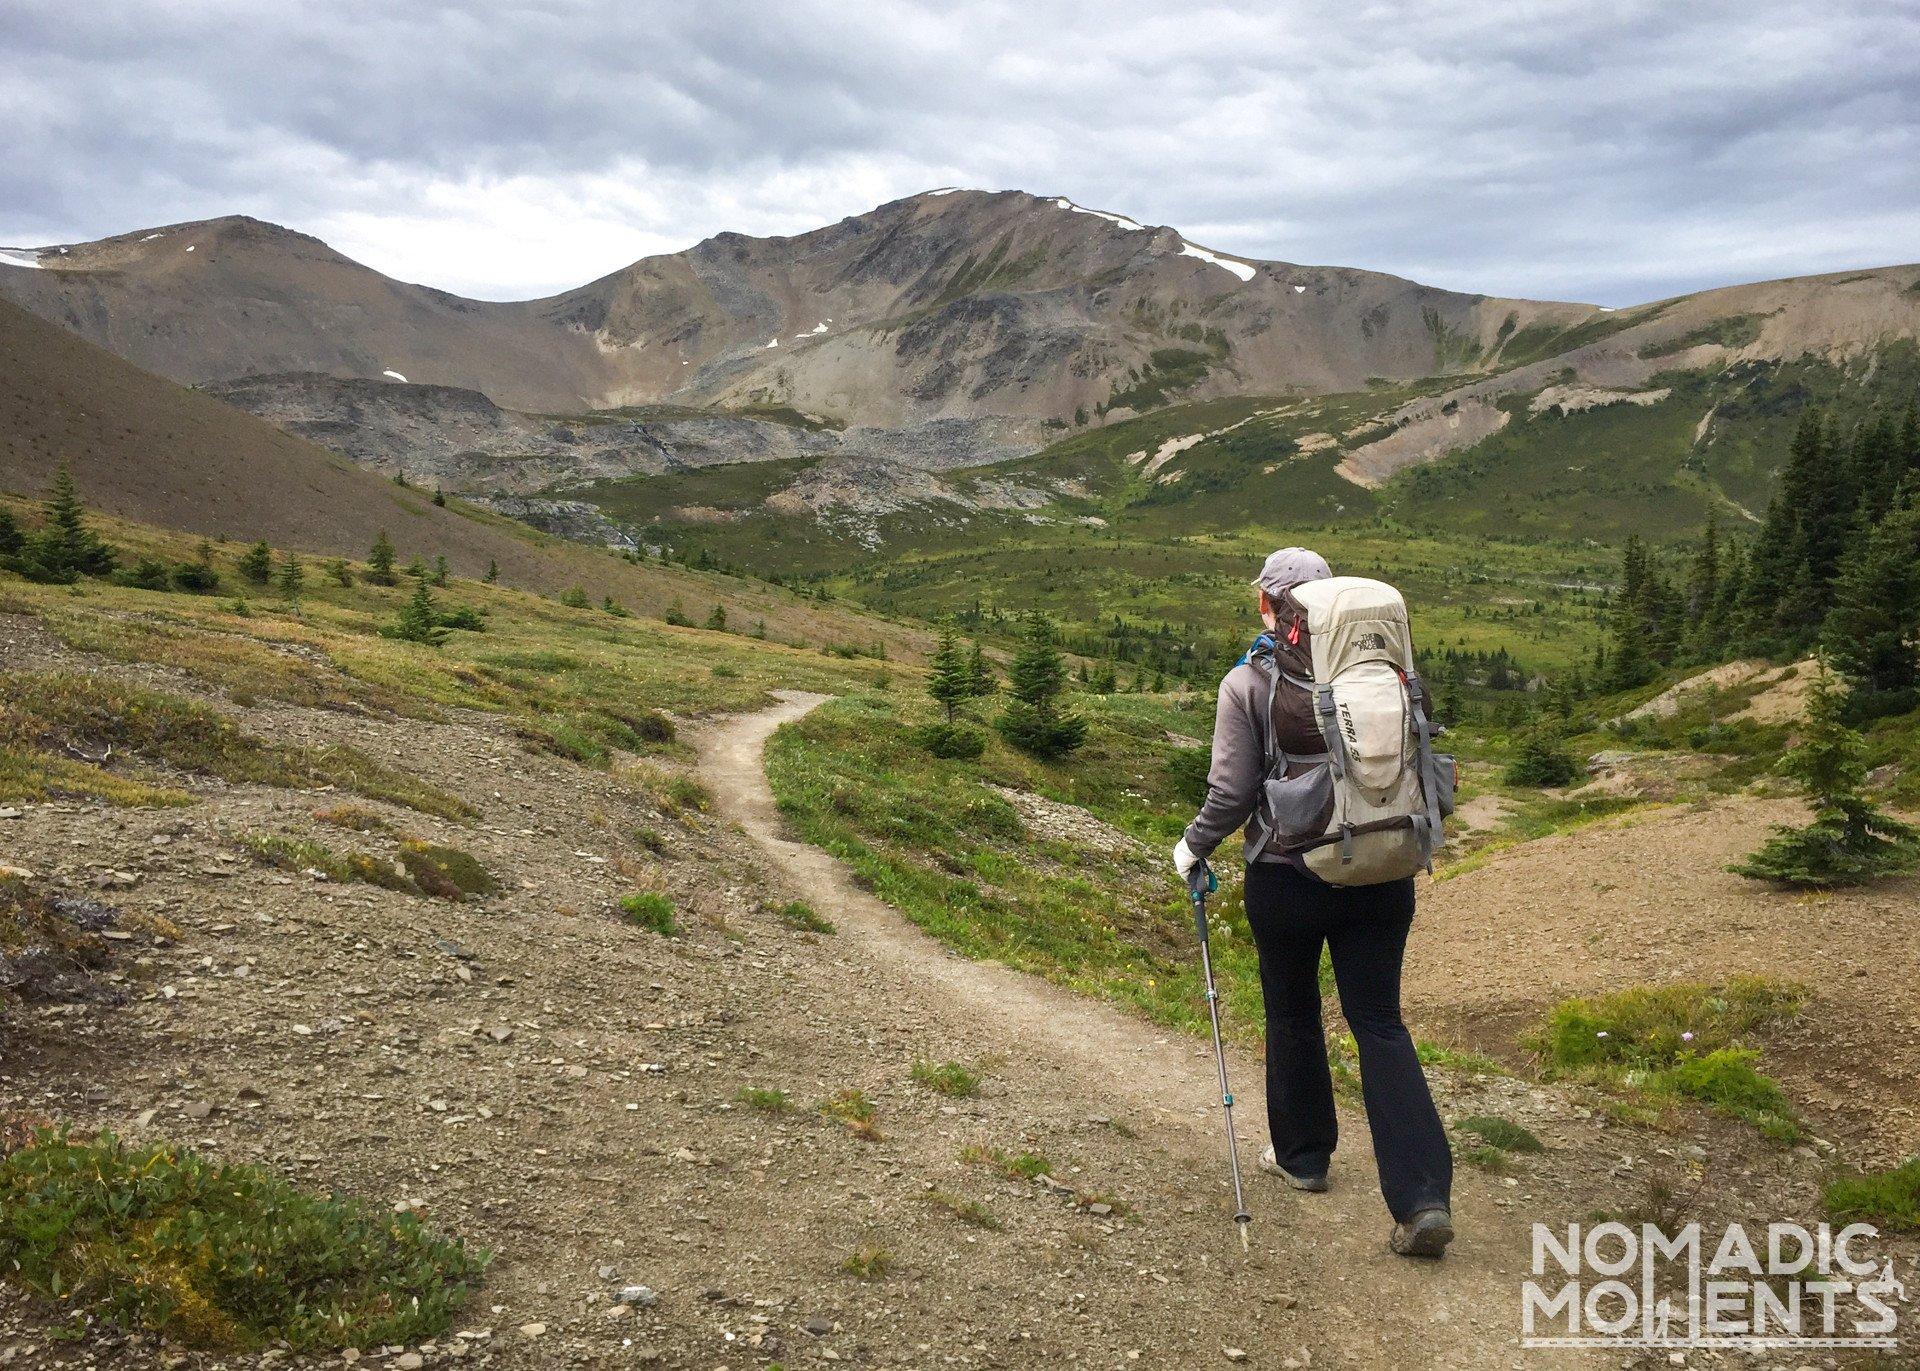 Little Shovel Pass - Hiking the Skyline Trail